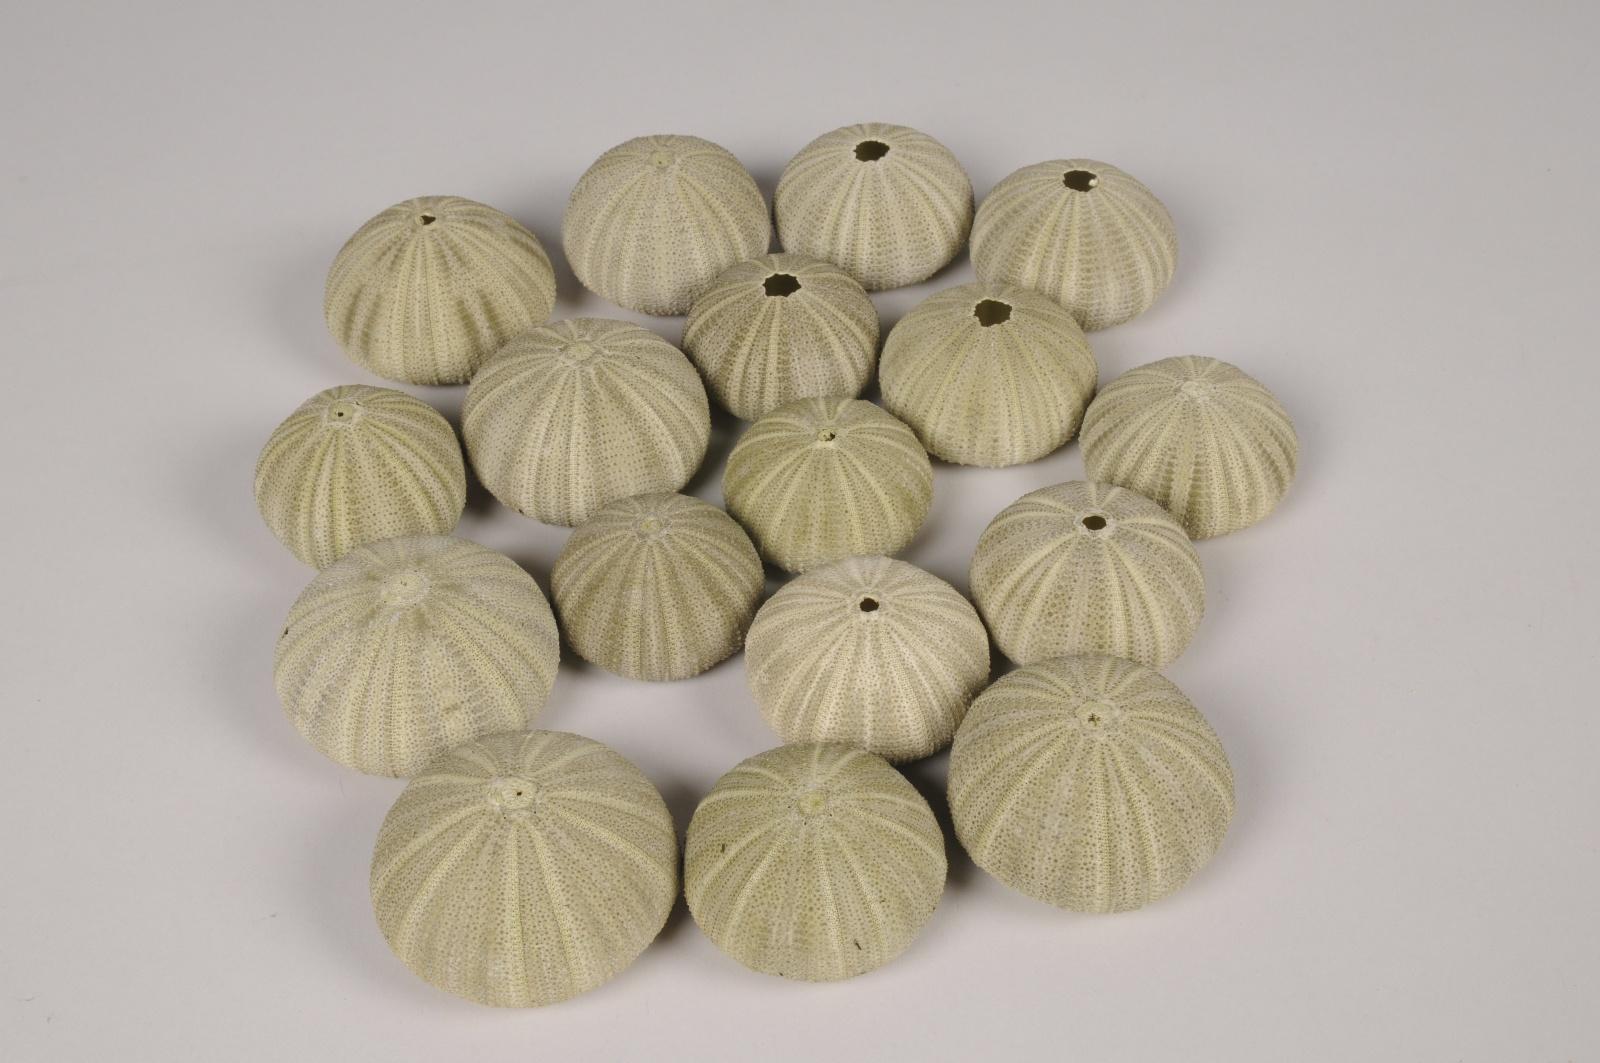 x310wg Coquillages oursins de mer verts D5cm